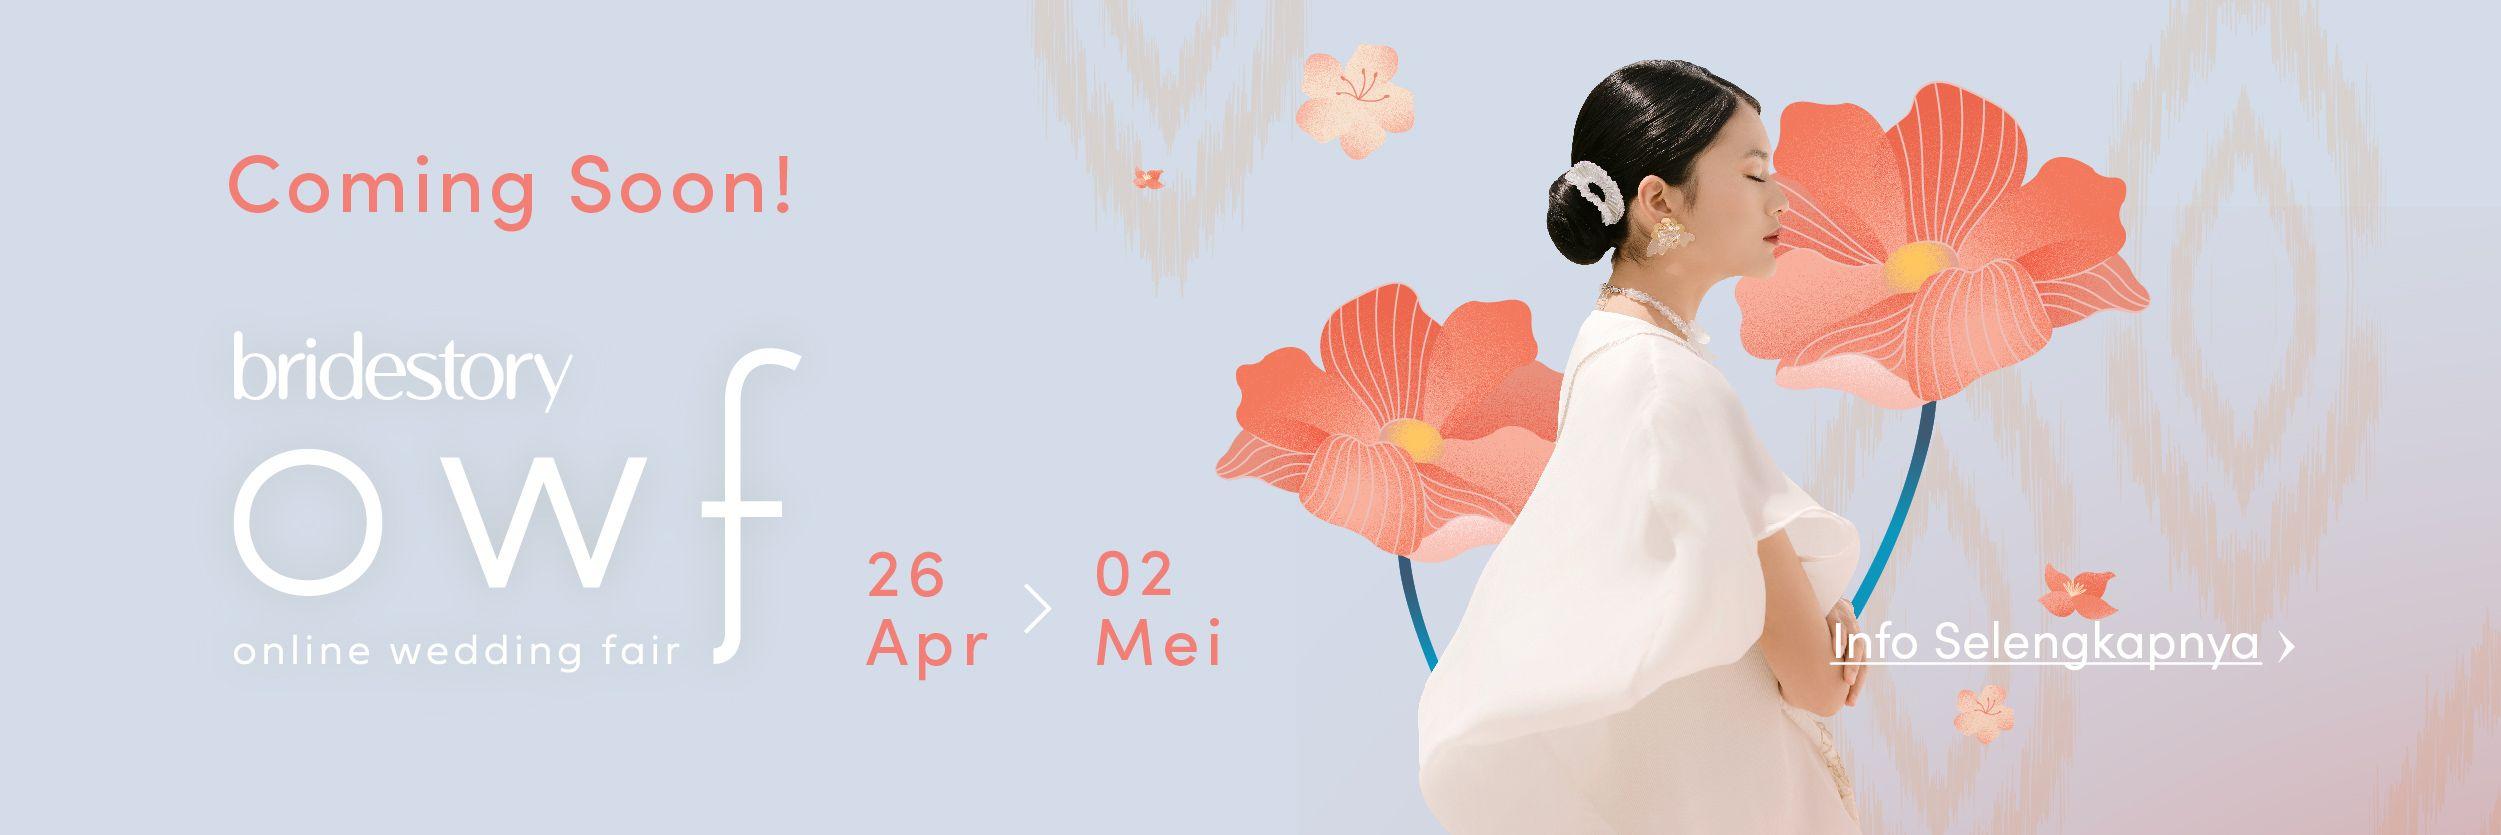 owf-april_homepage-banner-1200x400-user-coming-soon-B1wMpkdr_.jpg